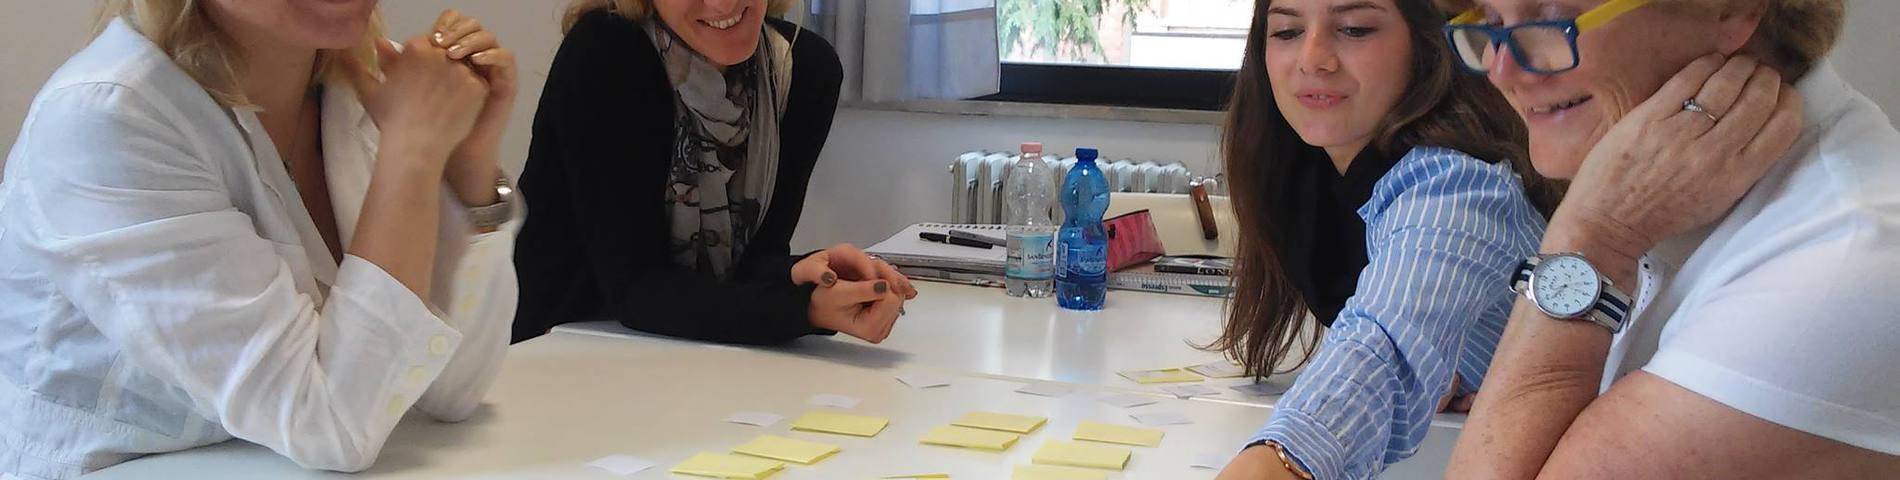 Centro Studi Idea Verona 사진 1